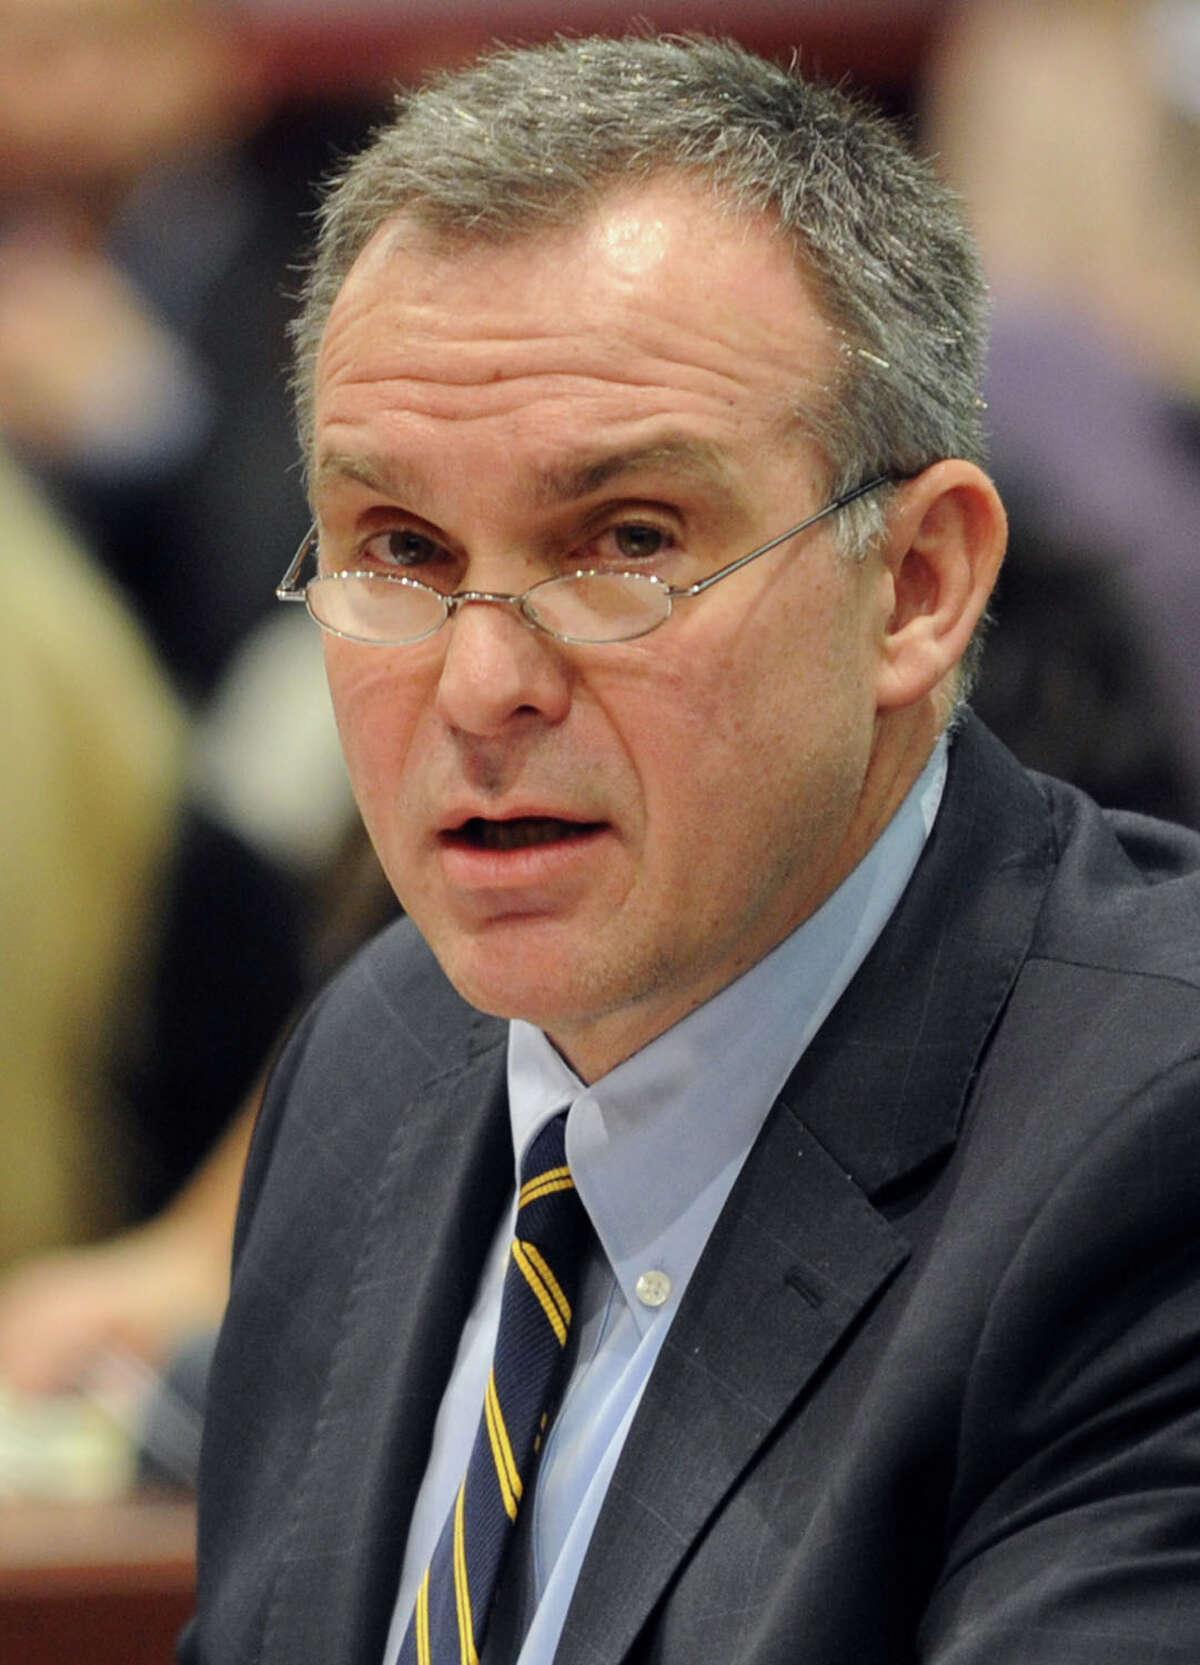 Danbury State's Attorney Stephen J. Sedensky III